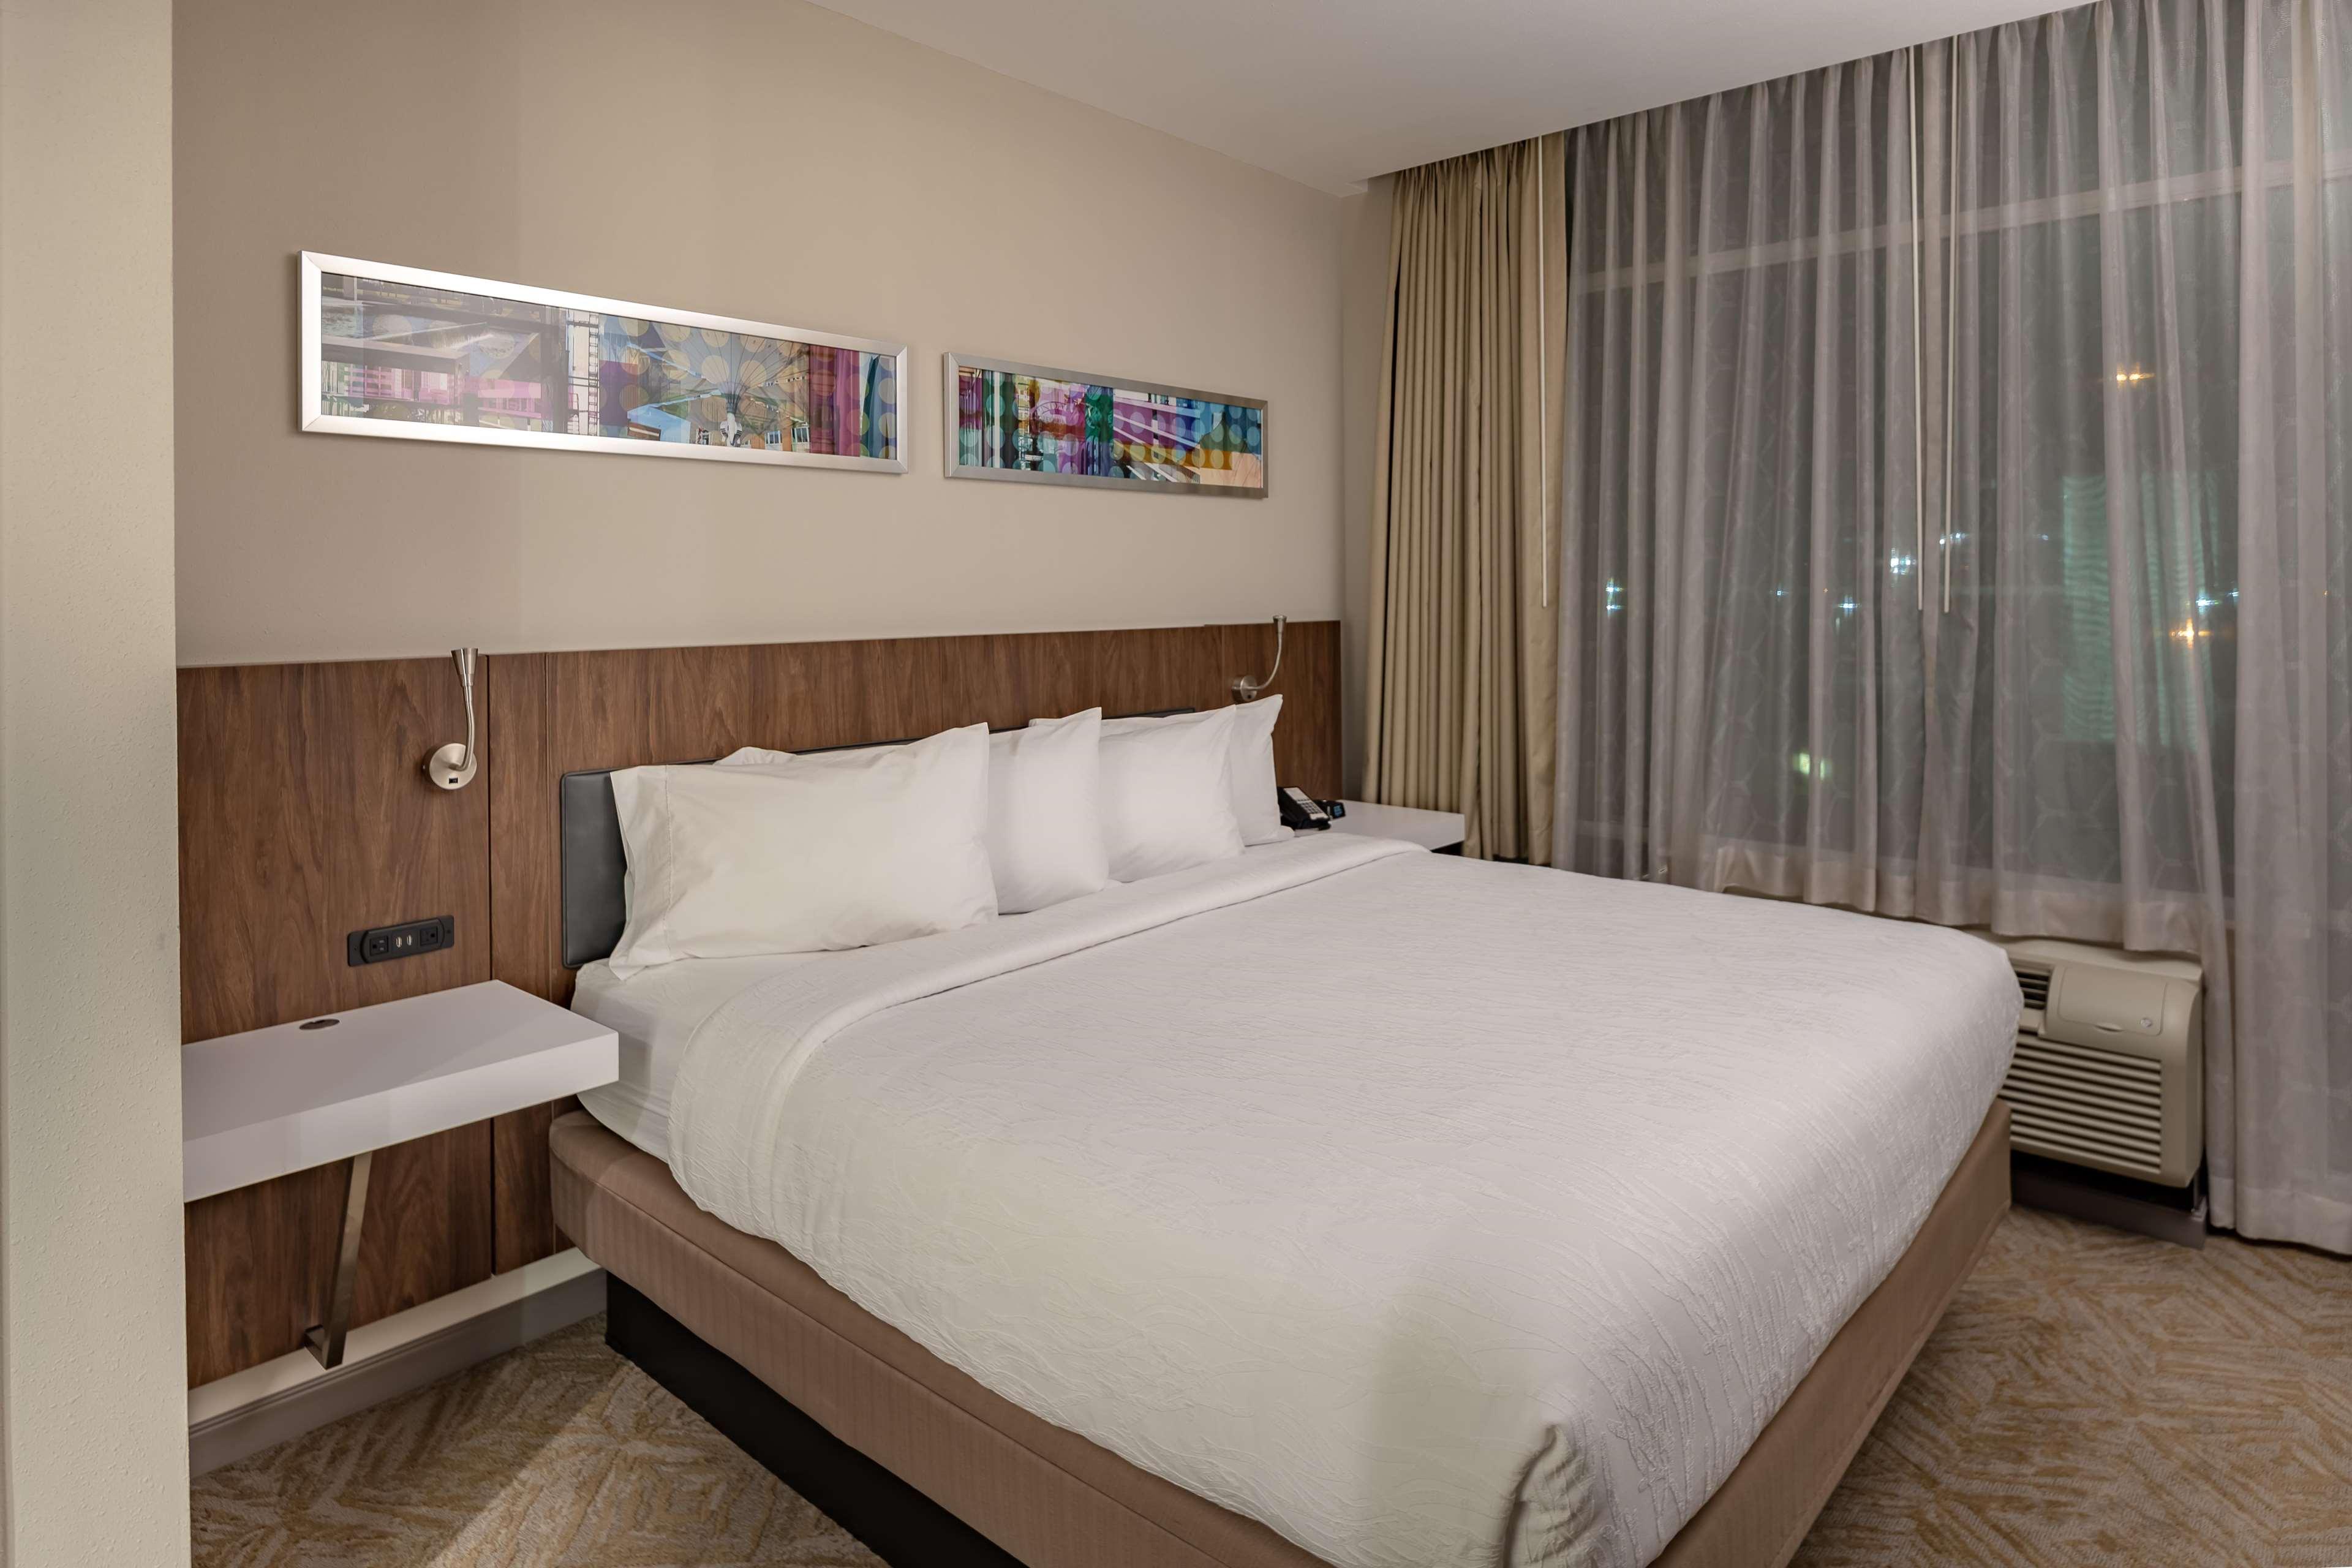 Hilton Garden Inn Dallas at Hurst Conference Center image 29